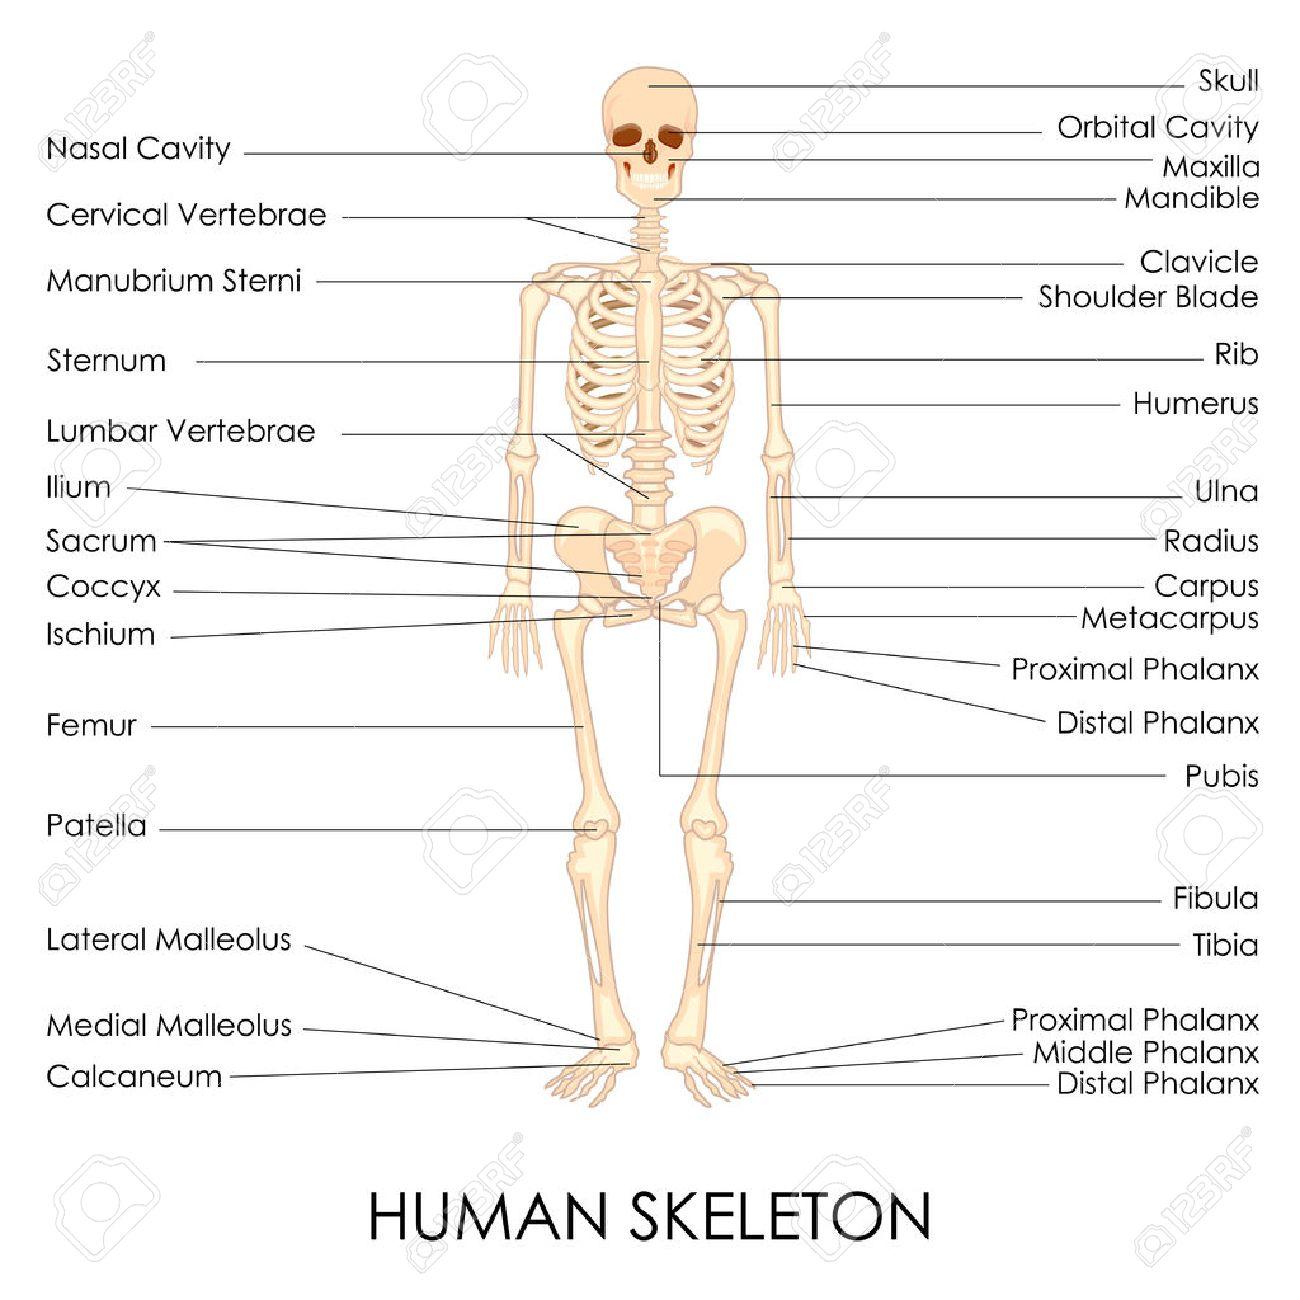 Vistoso Diagrama De Esqueleto Inspiración - Anatomía de Las ...